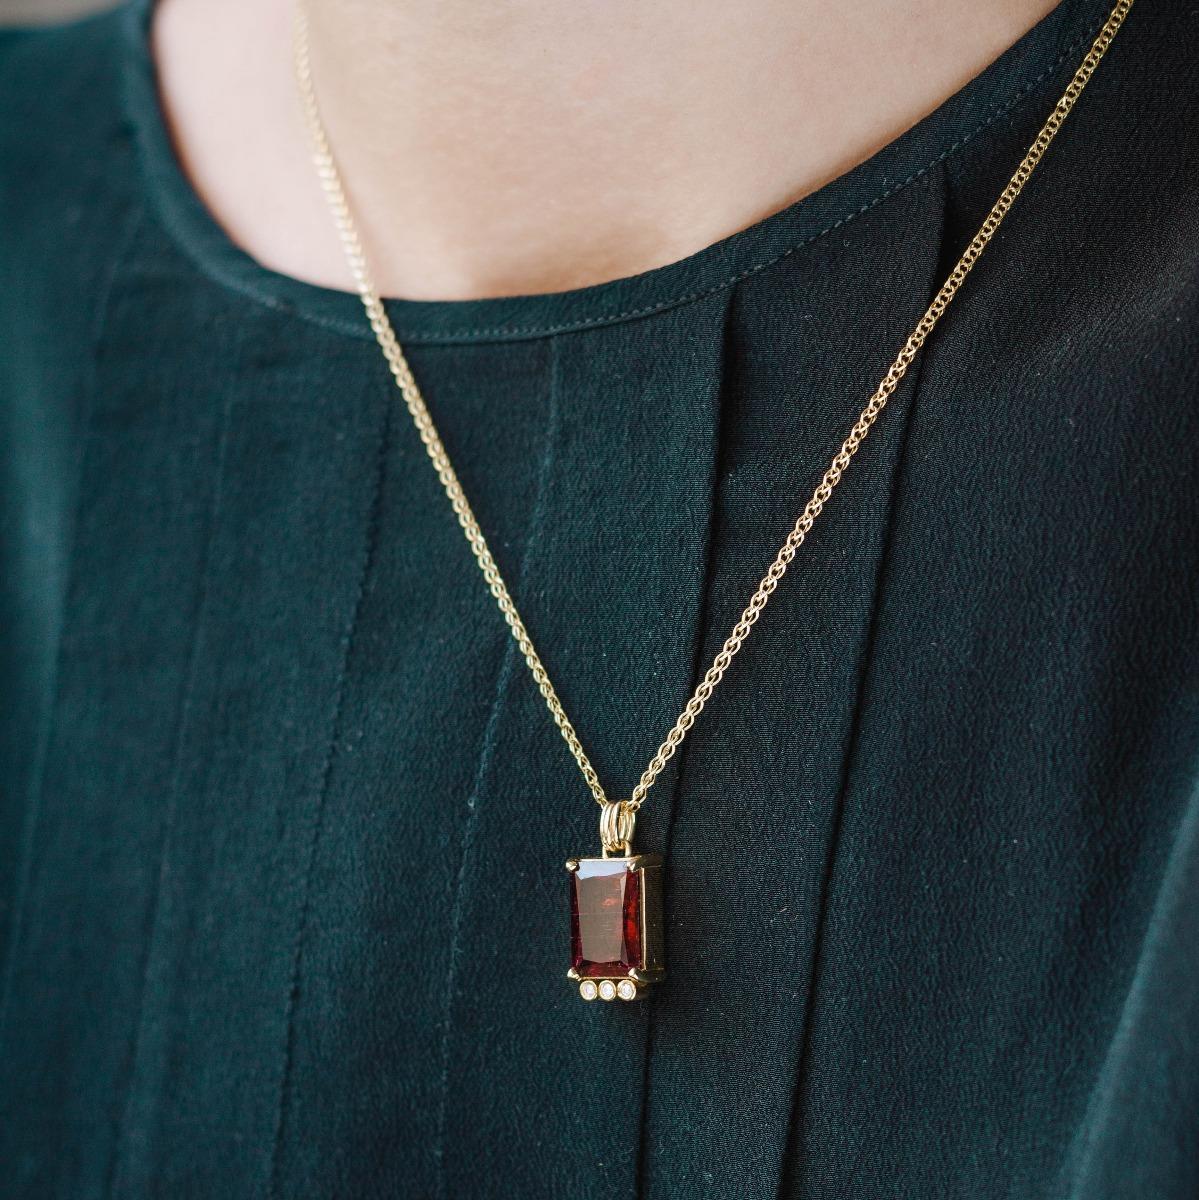 Rubellite Tourmaline Diamond Necklace Gold